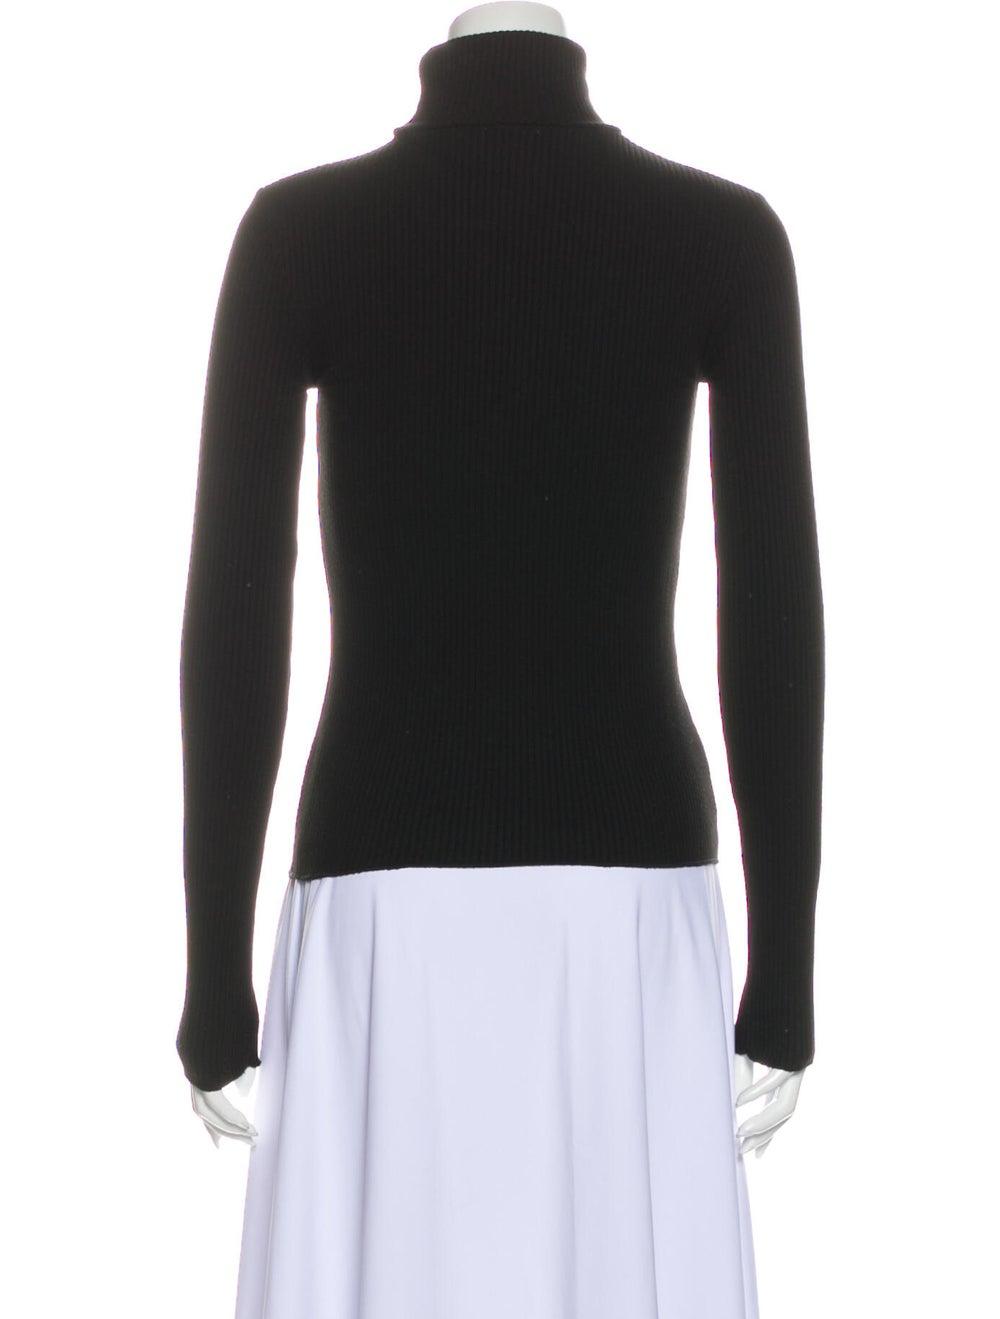 Re/done Turtleneck Sweater Black - image 3